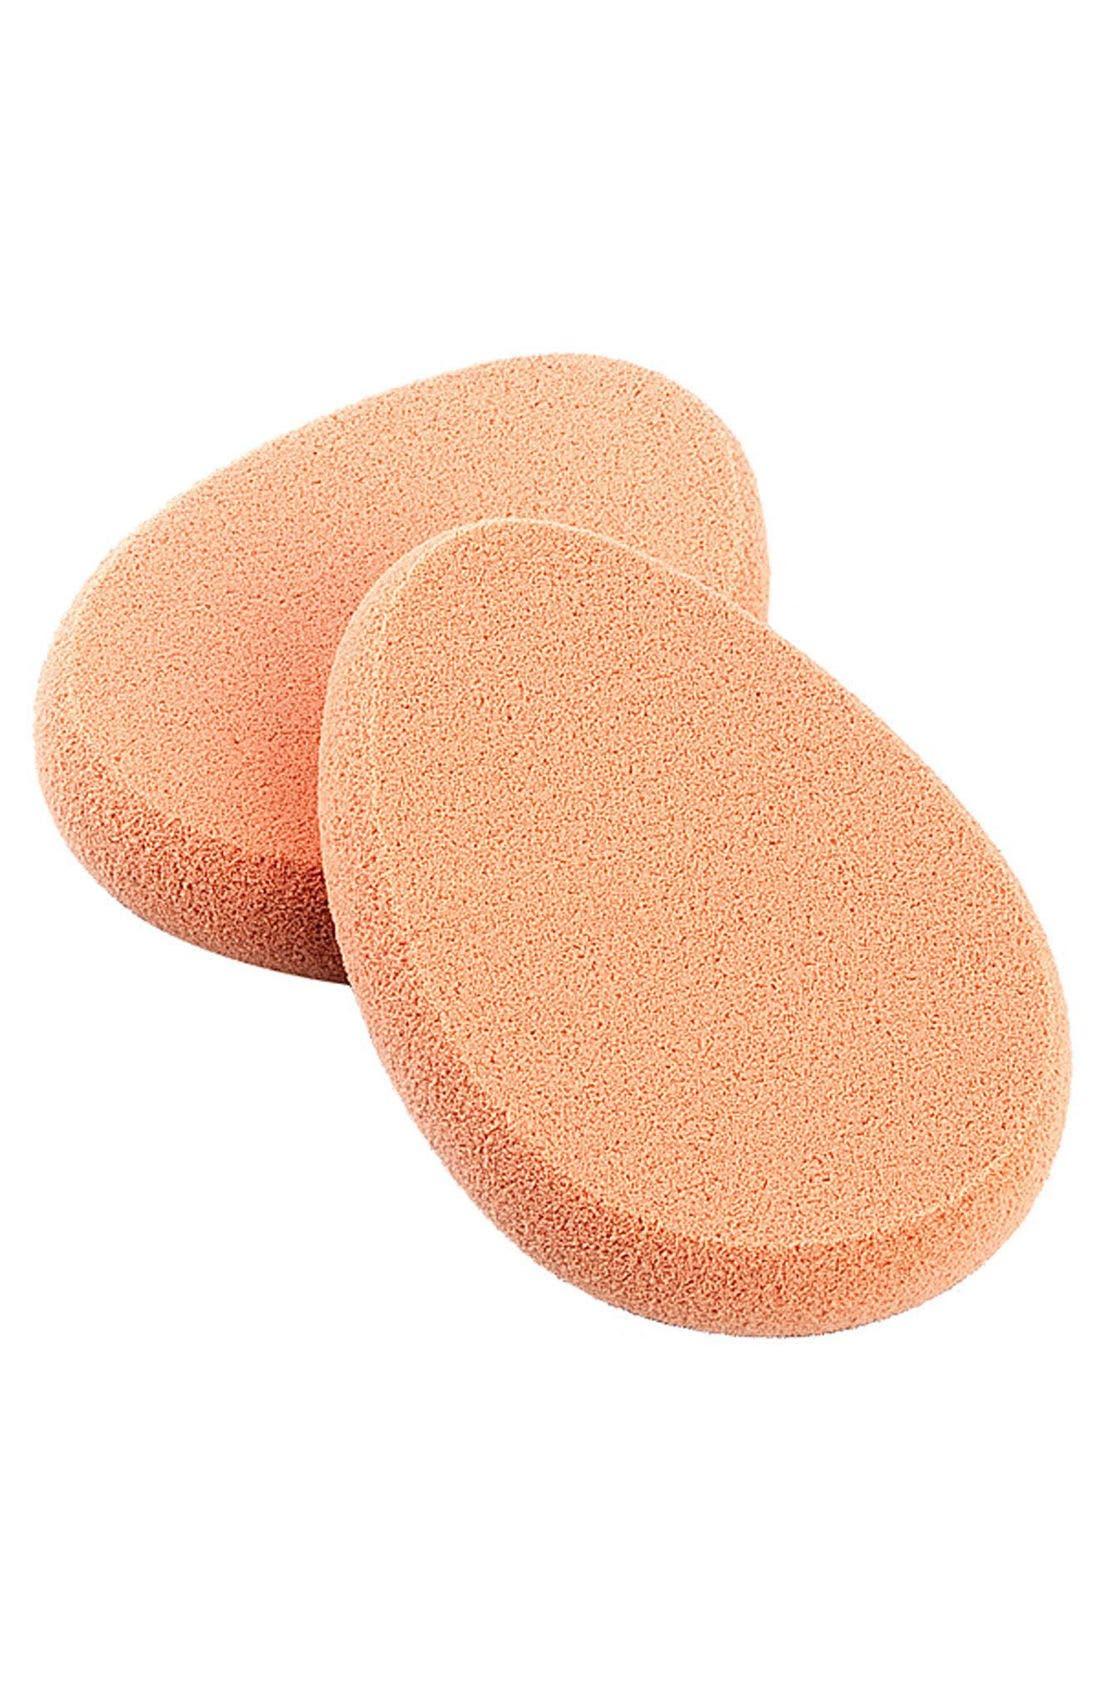 Laura Mercier 4-Pack Sponges